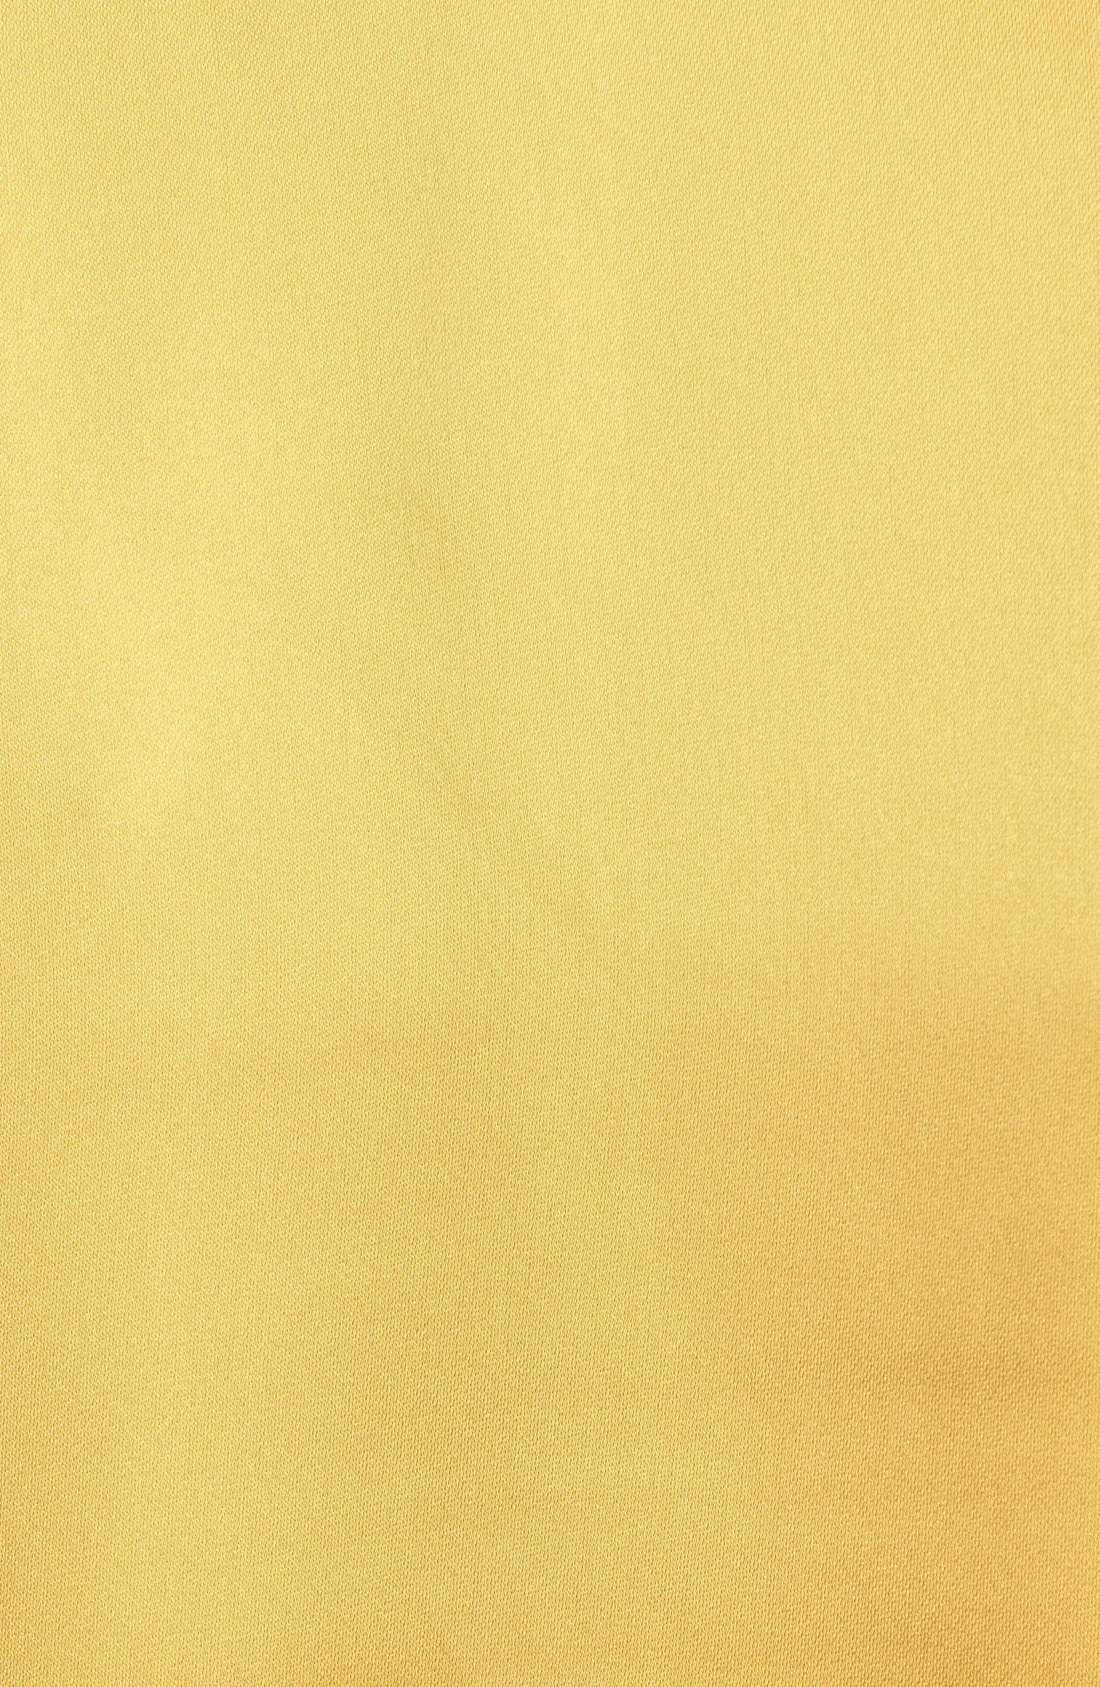 Alternate Image 3  - Kenneth Cole New York 'Hester' Ruffle Blouse (Petite)